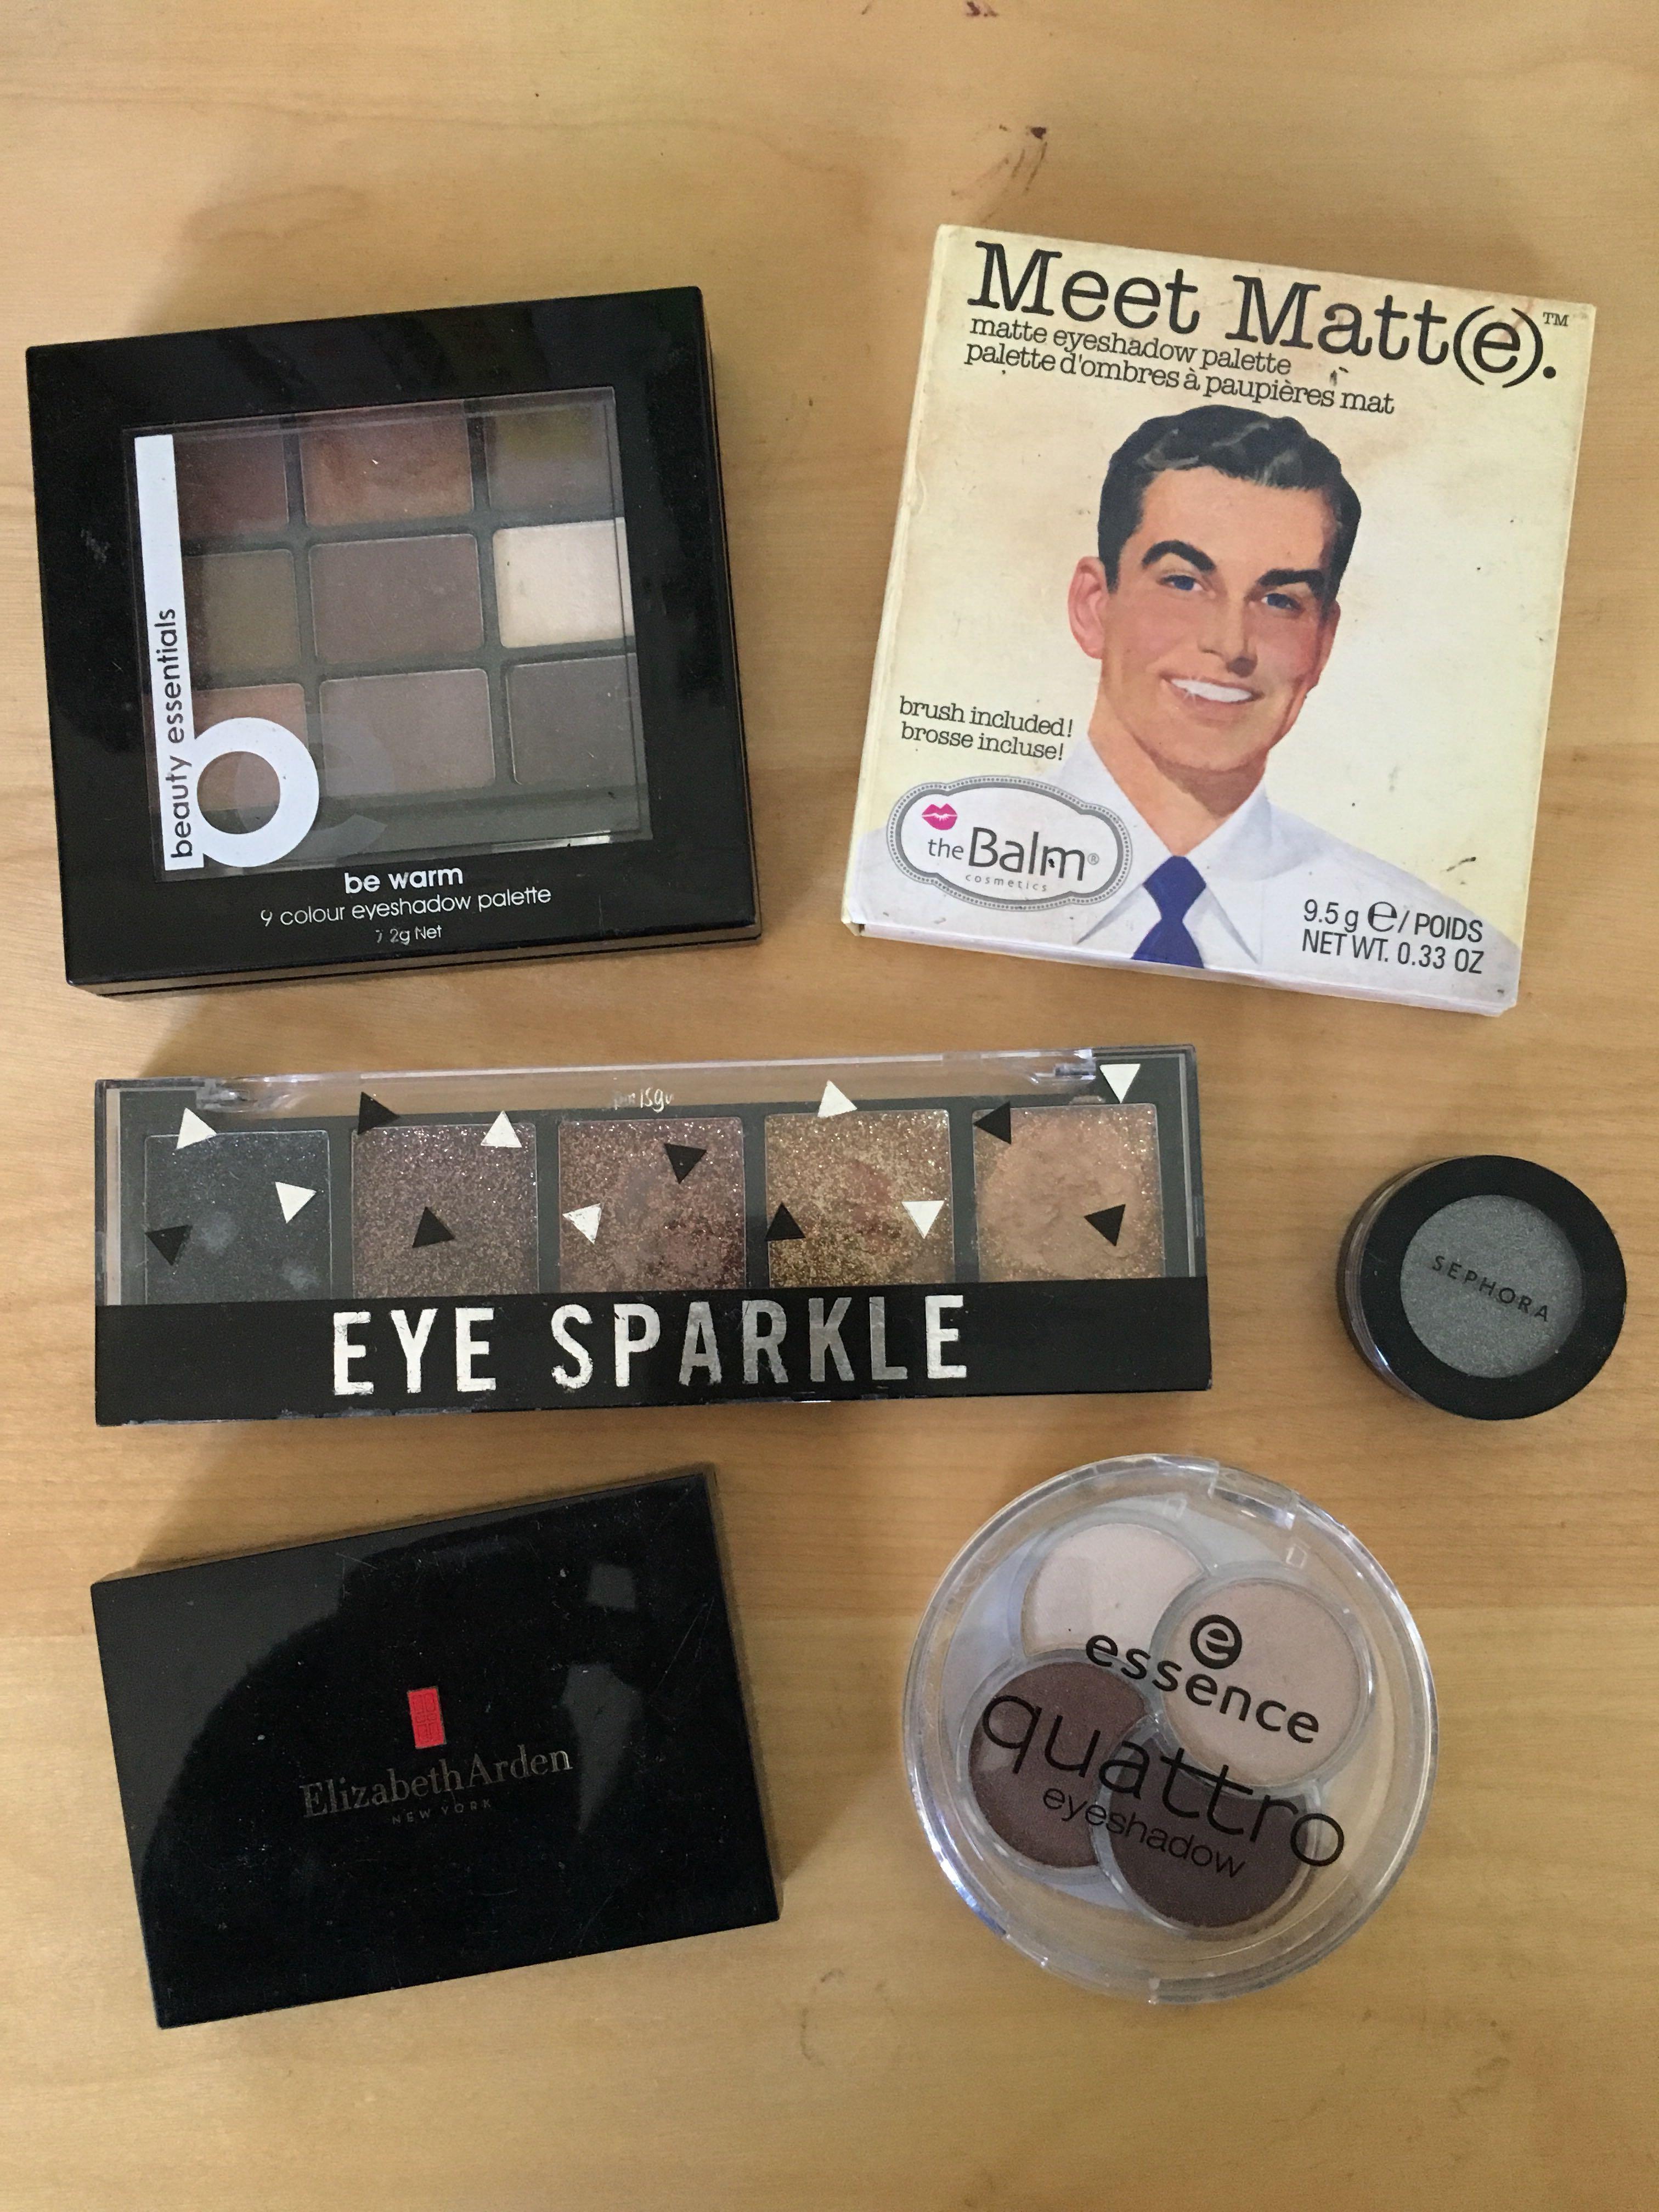 Assorted eyeshadows - Elizabeth Arden, Sephora, the balm